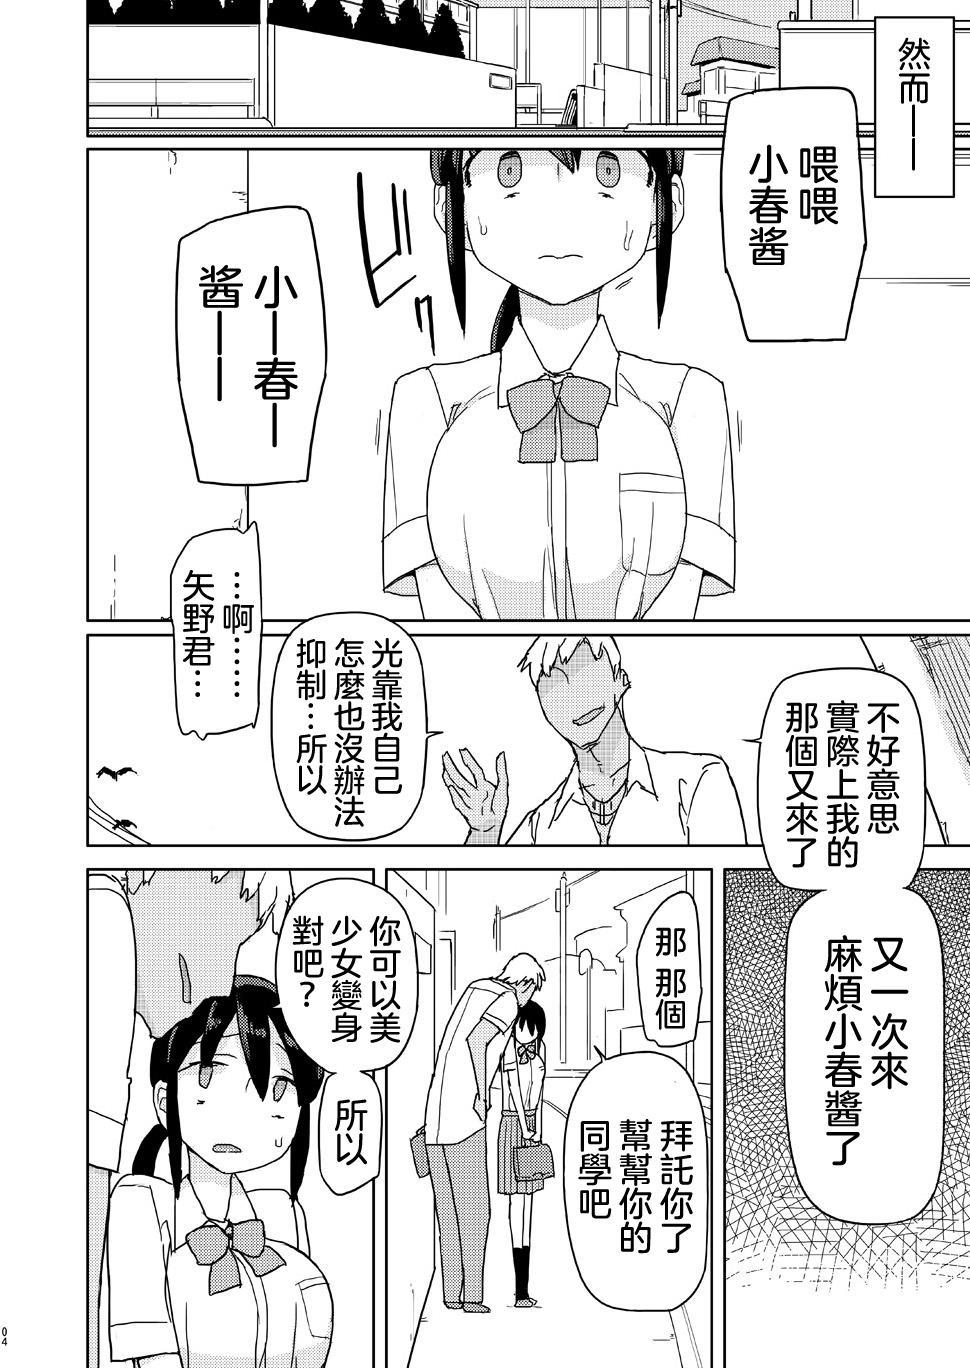 Ore ga Ijimeteta Onna ga Henshin Heroine ni Natta node 丨被我欺負過的女人竟然成為了變身美少女 3